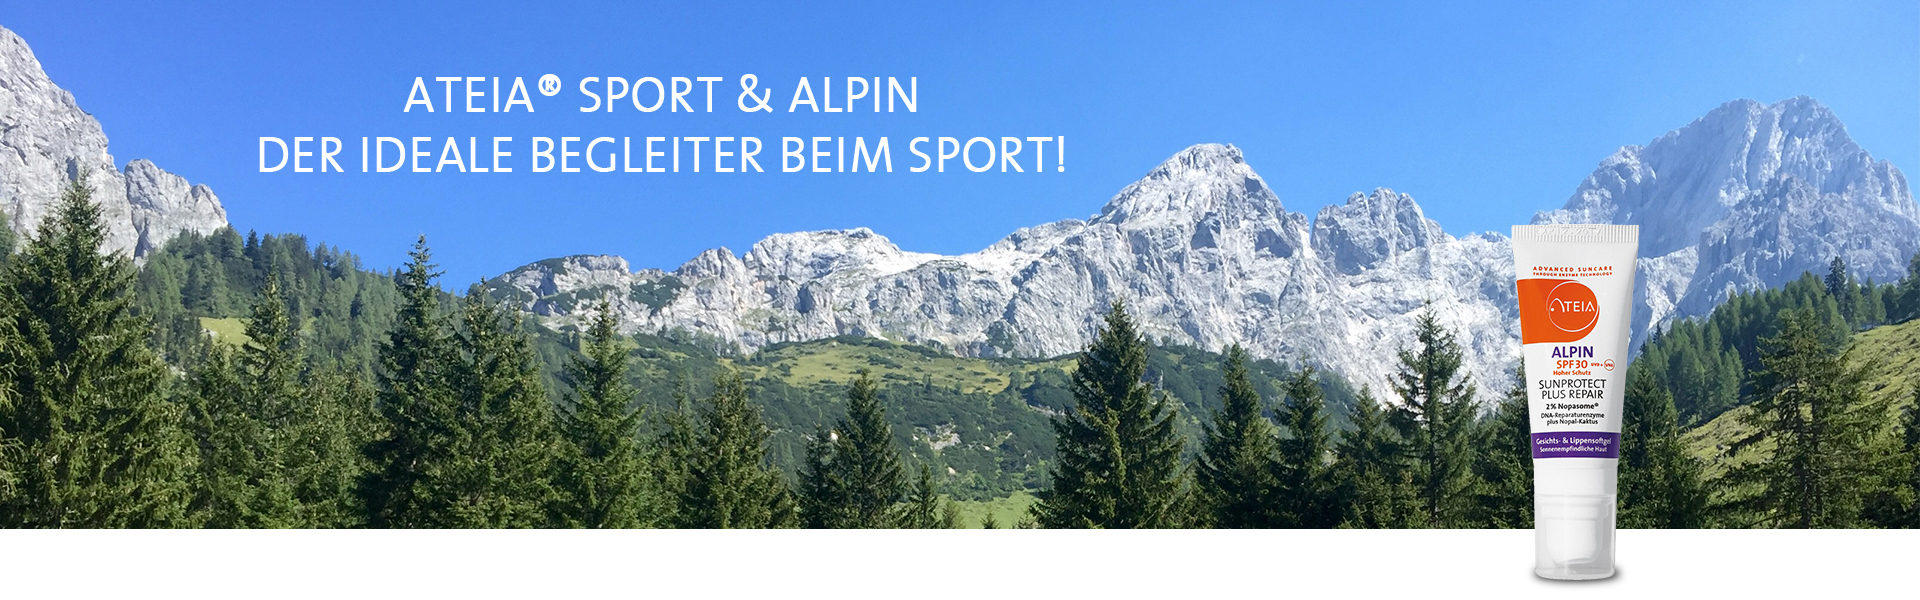 Ateia Sport & Alpin